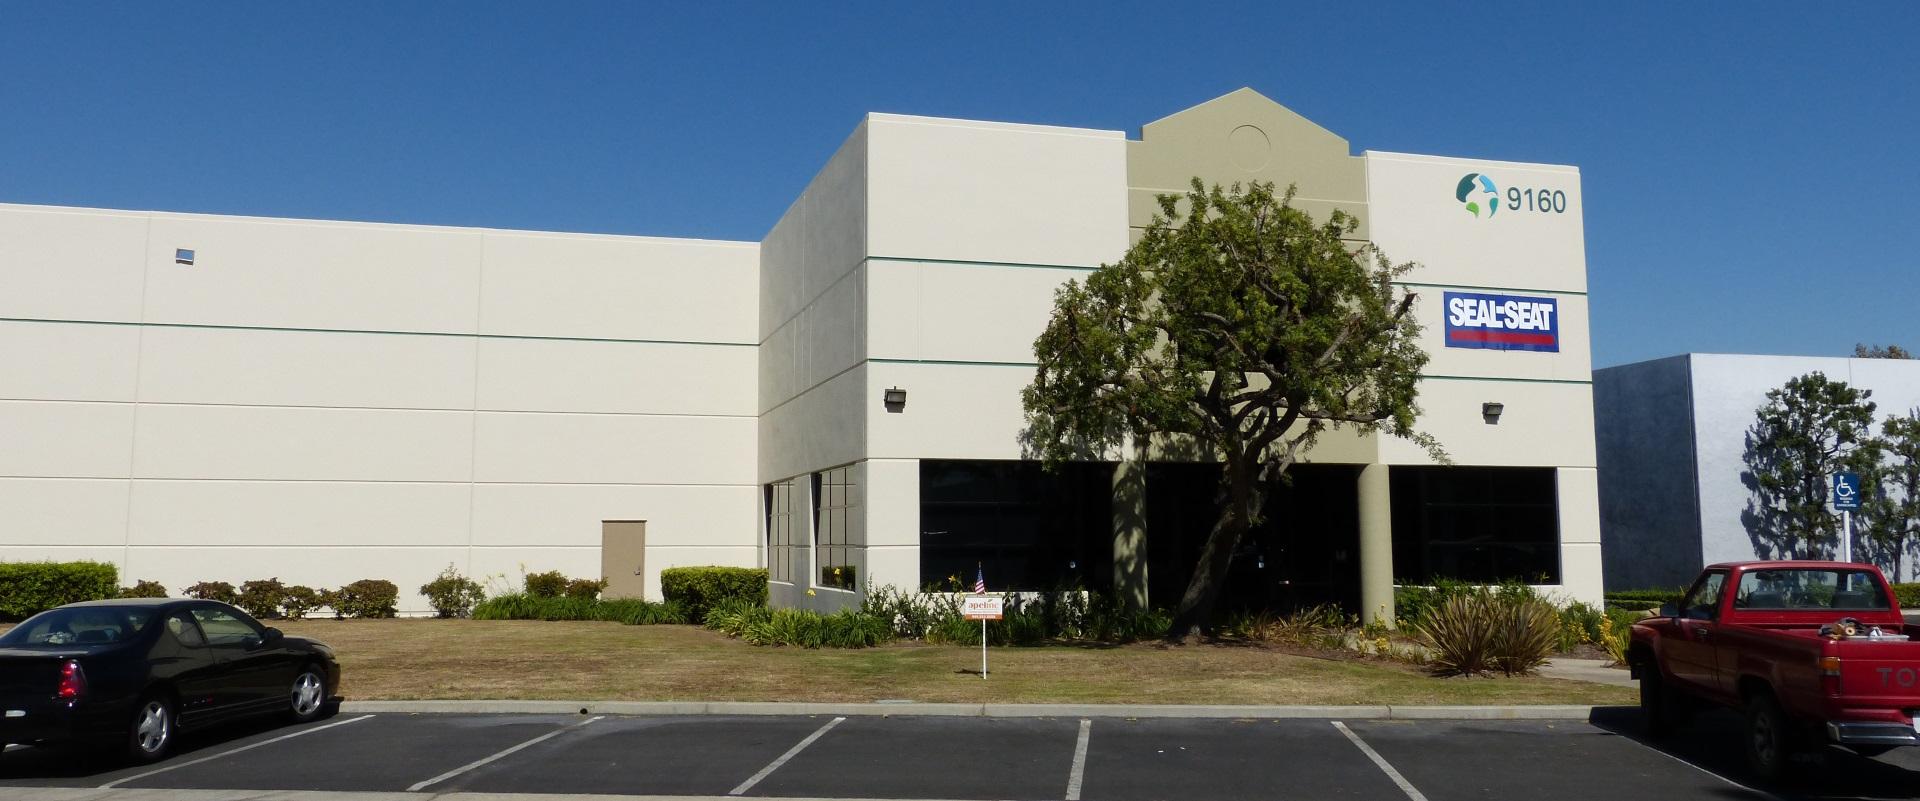 facility-new.jpg